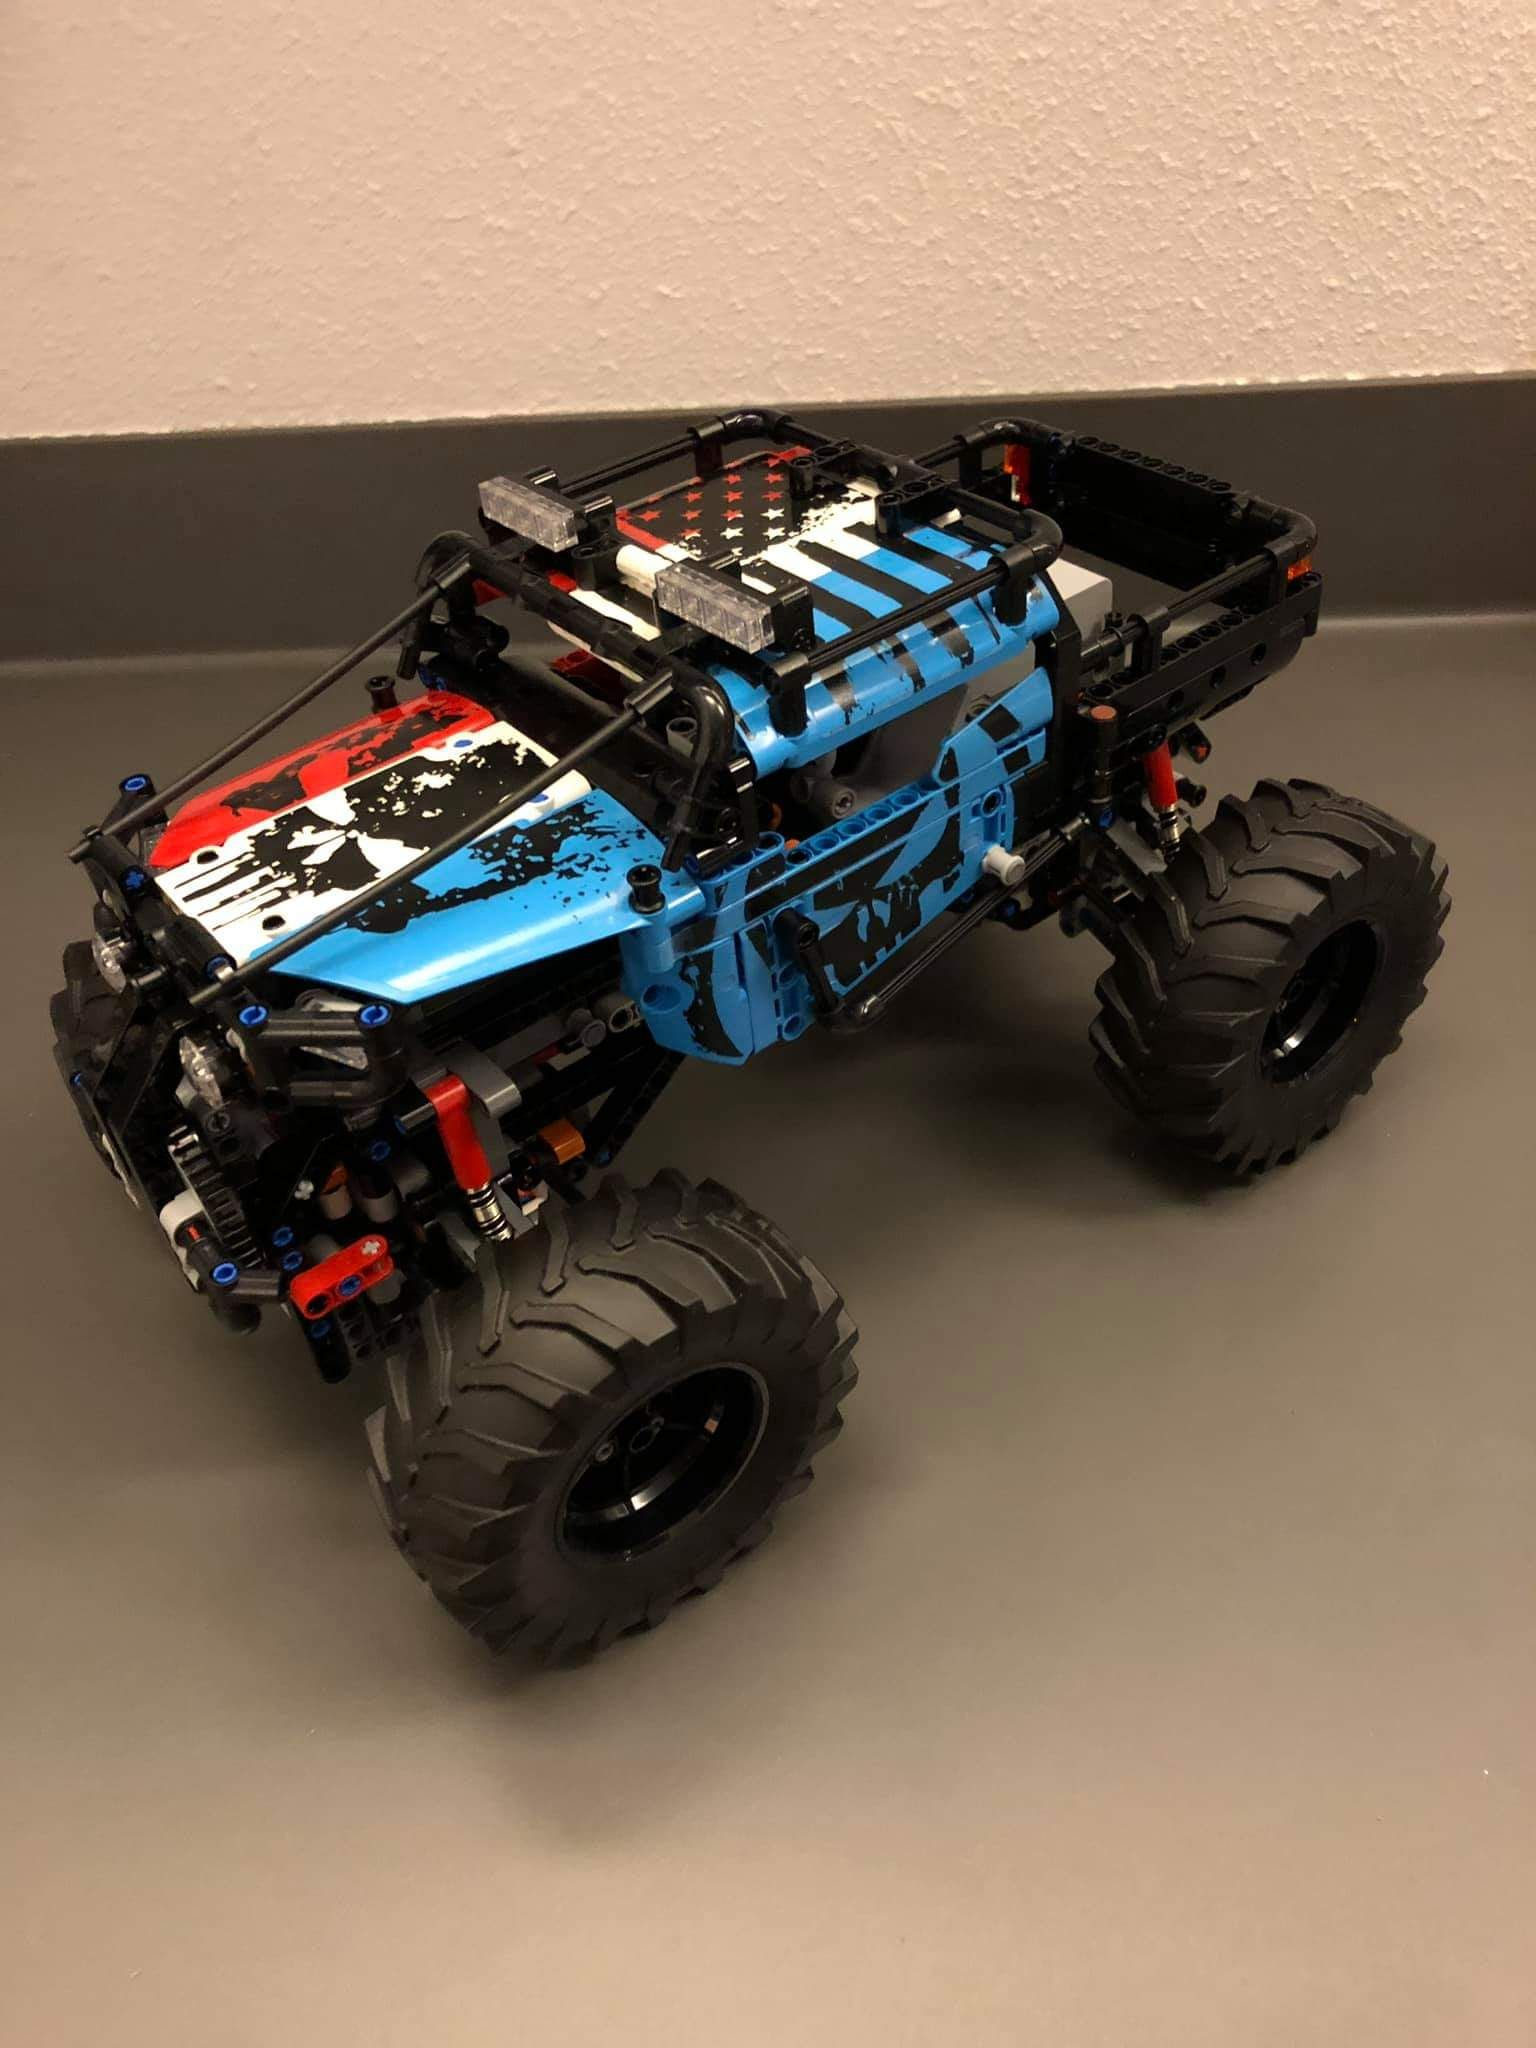 Lego Technic 4x4 X Treme Off Roader 42099 Lego Technic Lego Creations Lego